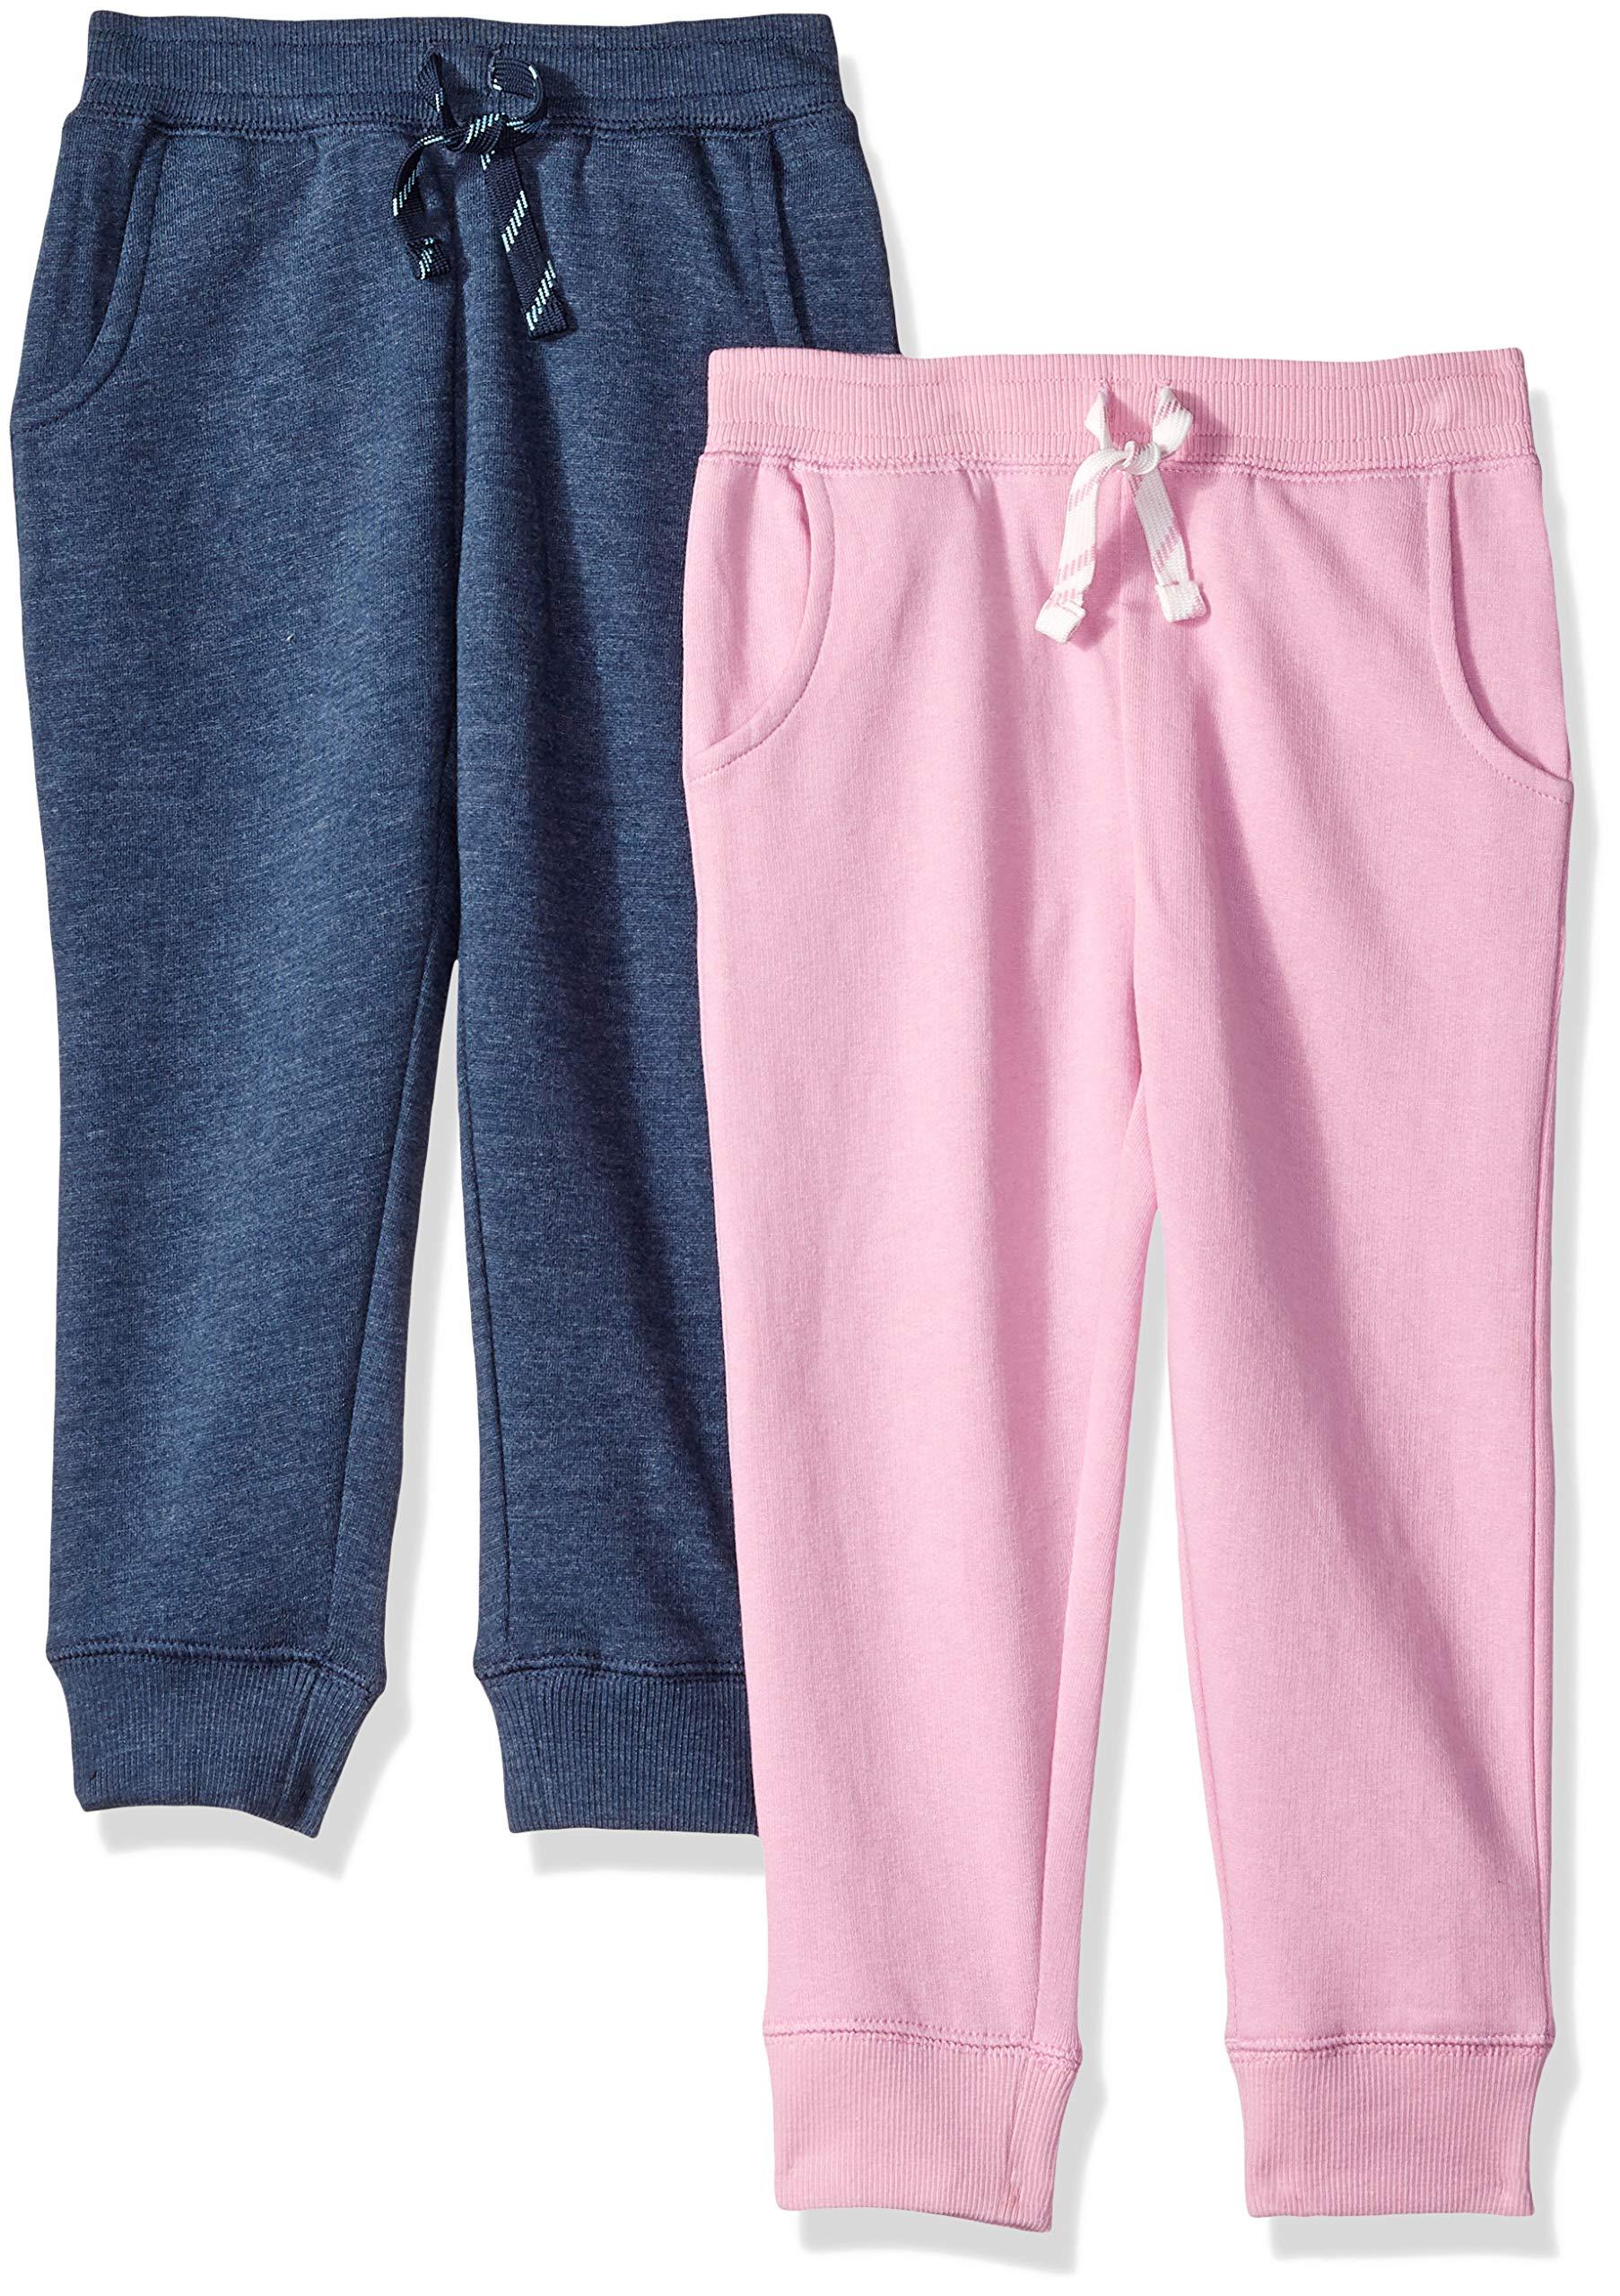 Amazon Brand - Spotted Zebra Girls' Big Kid 2-Pack Fleece Jogger Pants, Grey/Pink, Large (10)